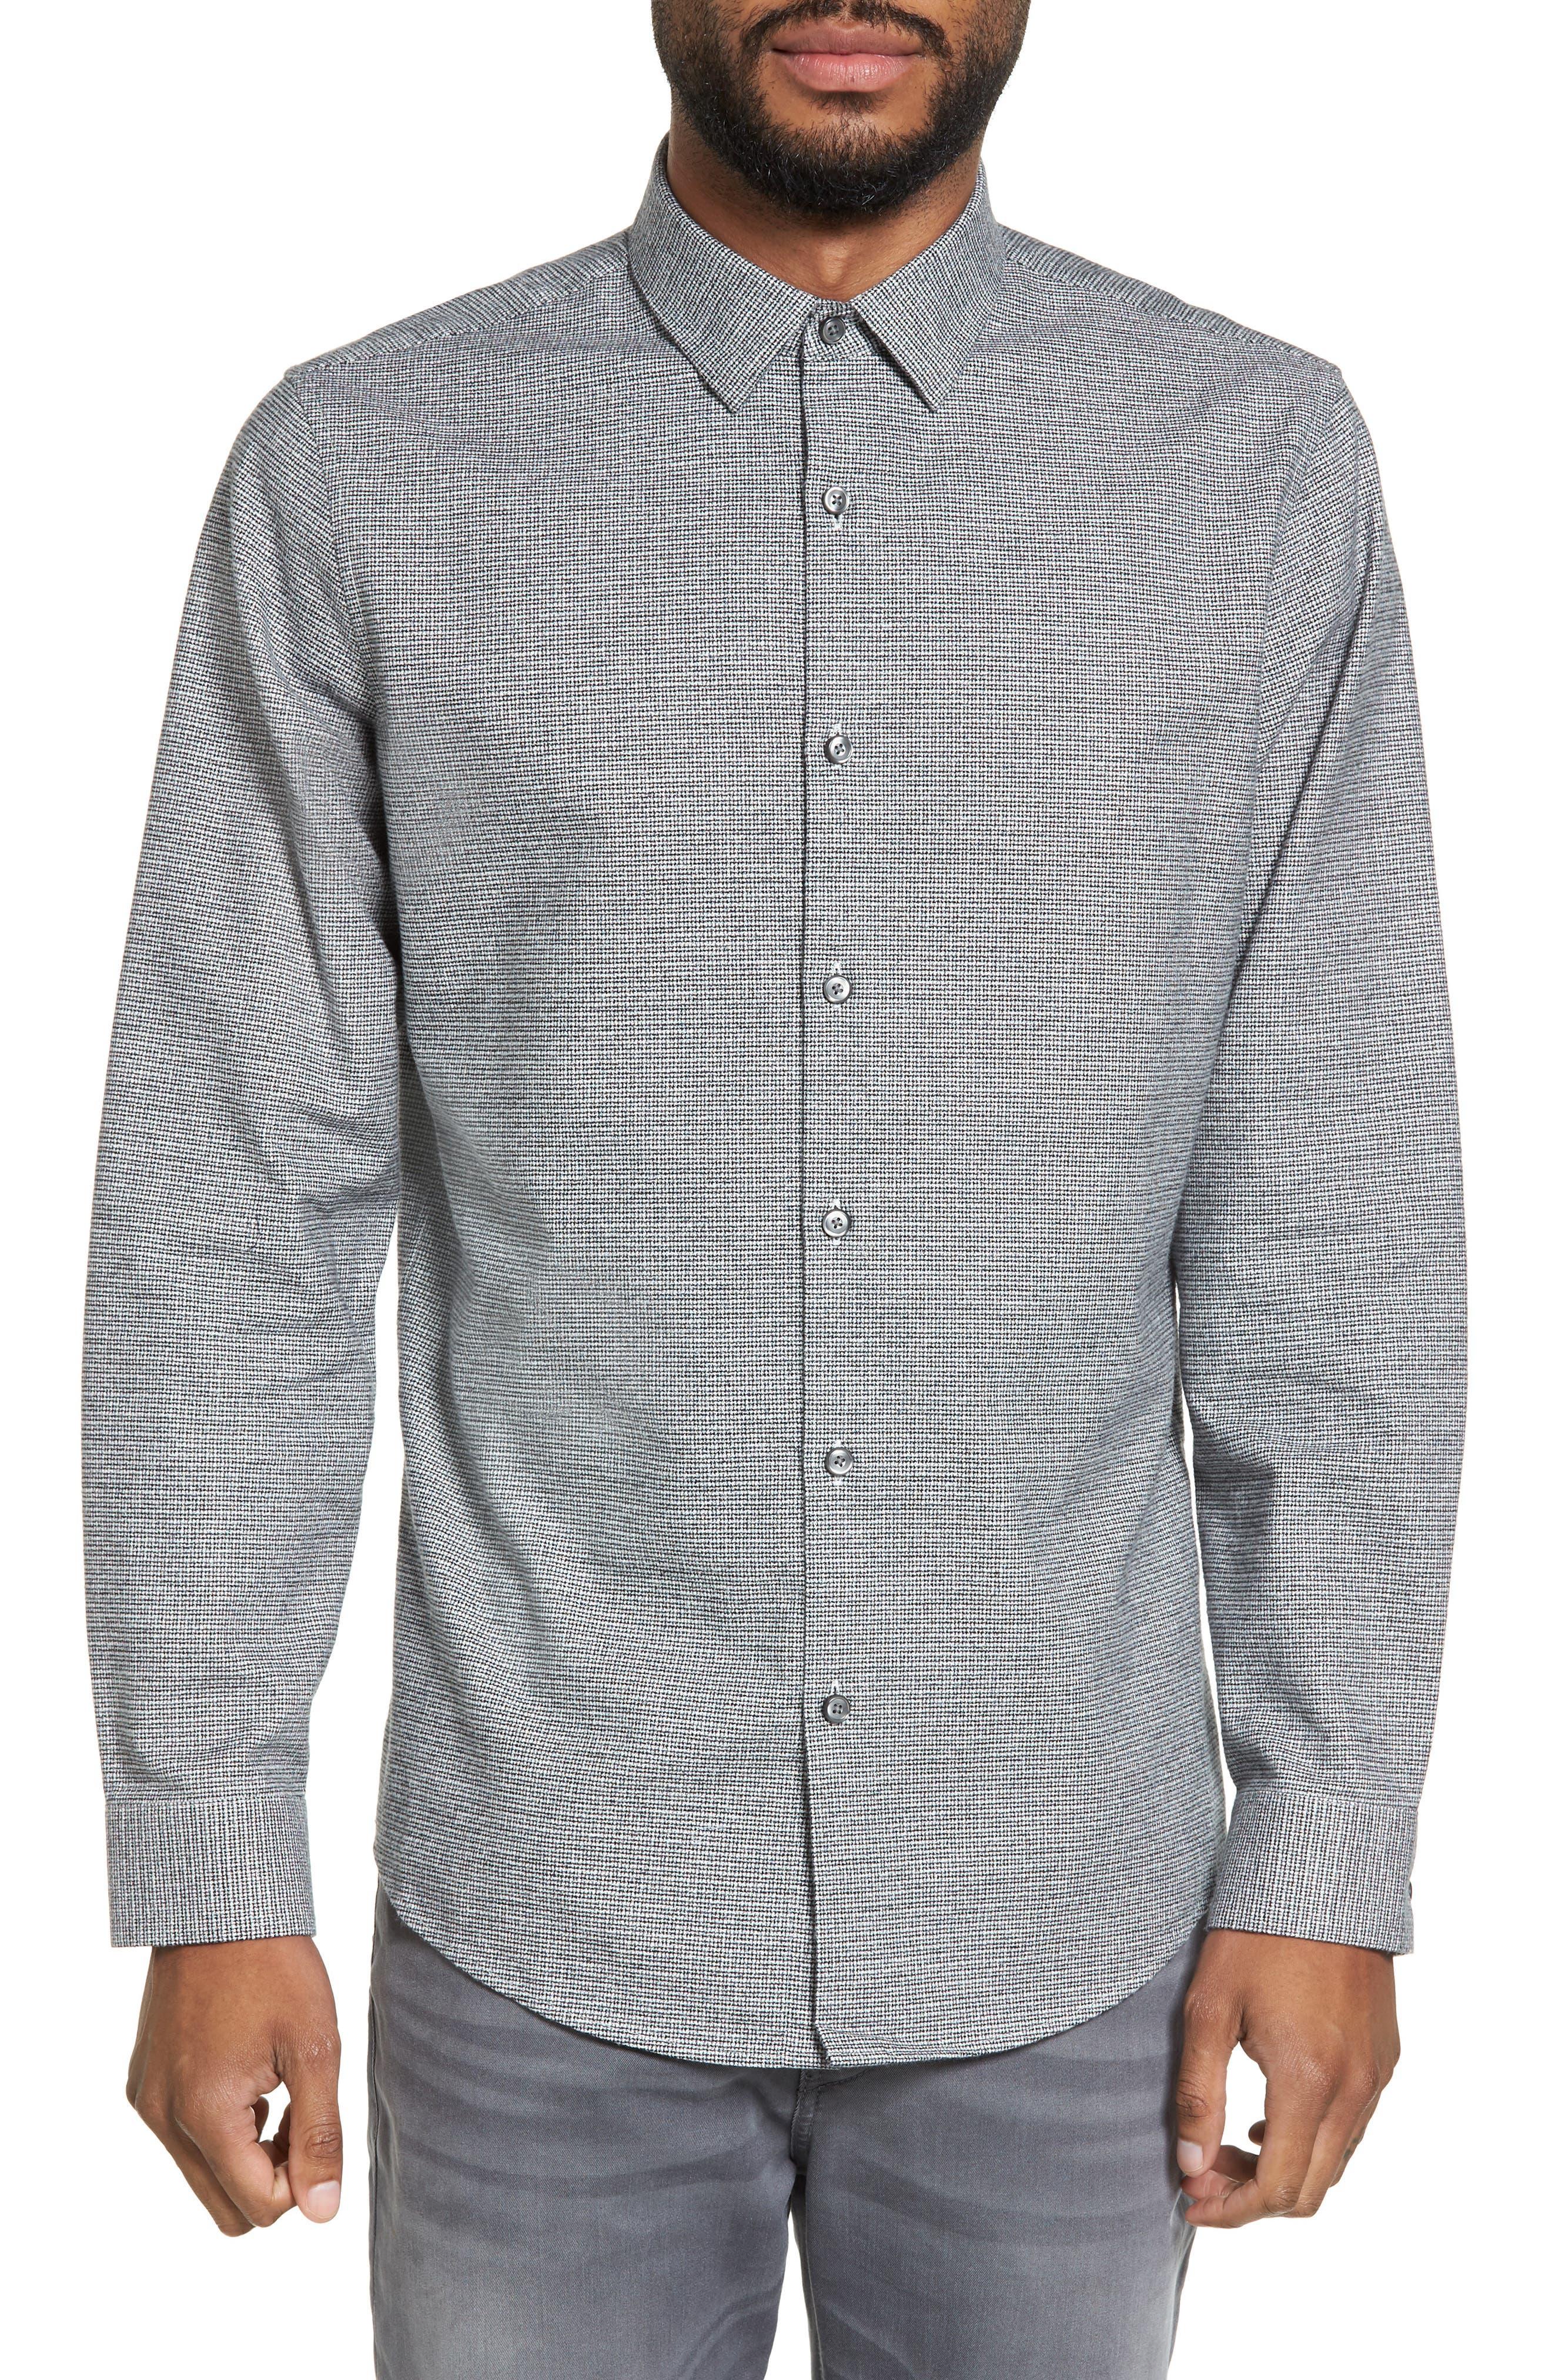 Main Image - Calibrate Flannel Sport Shirt